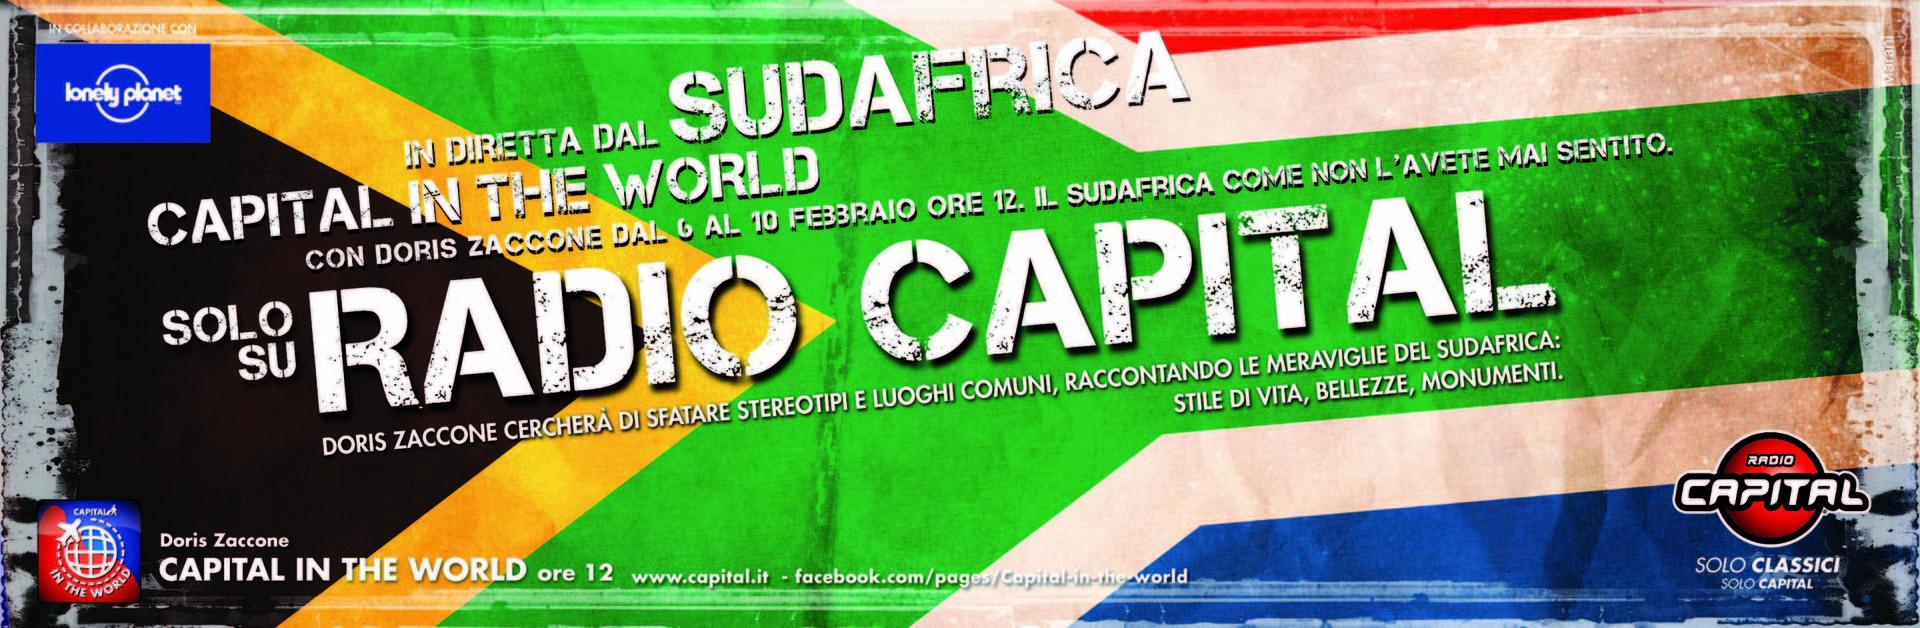 Capital+in+the+world+dal+sudafrica